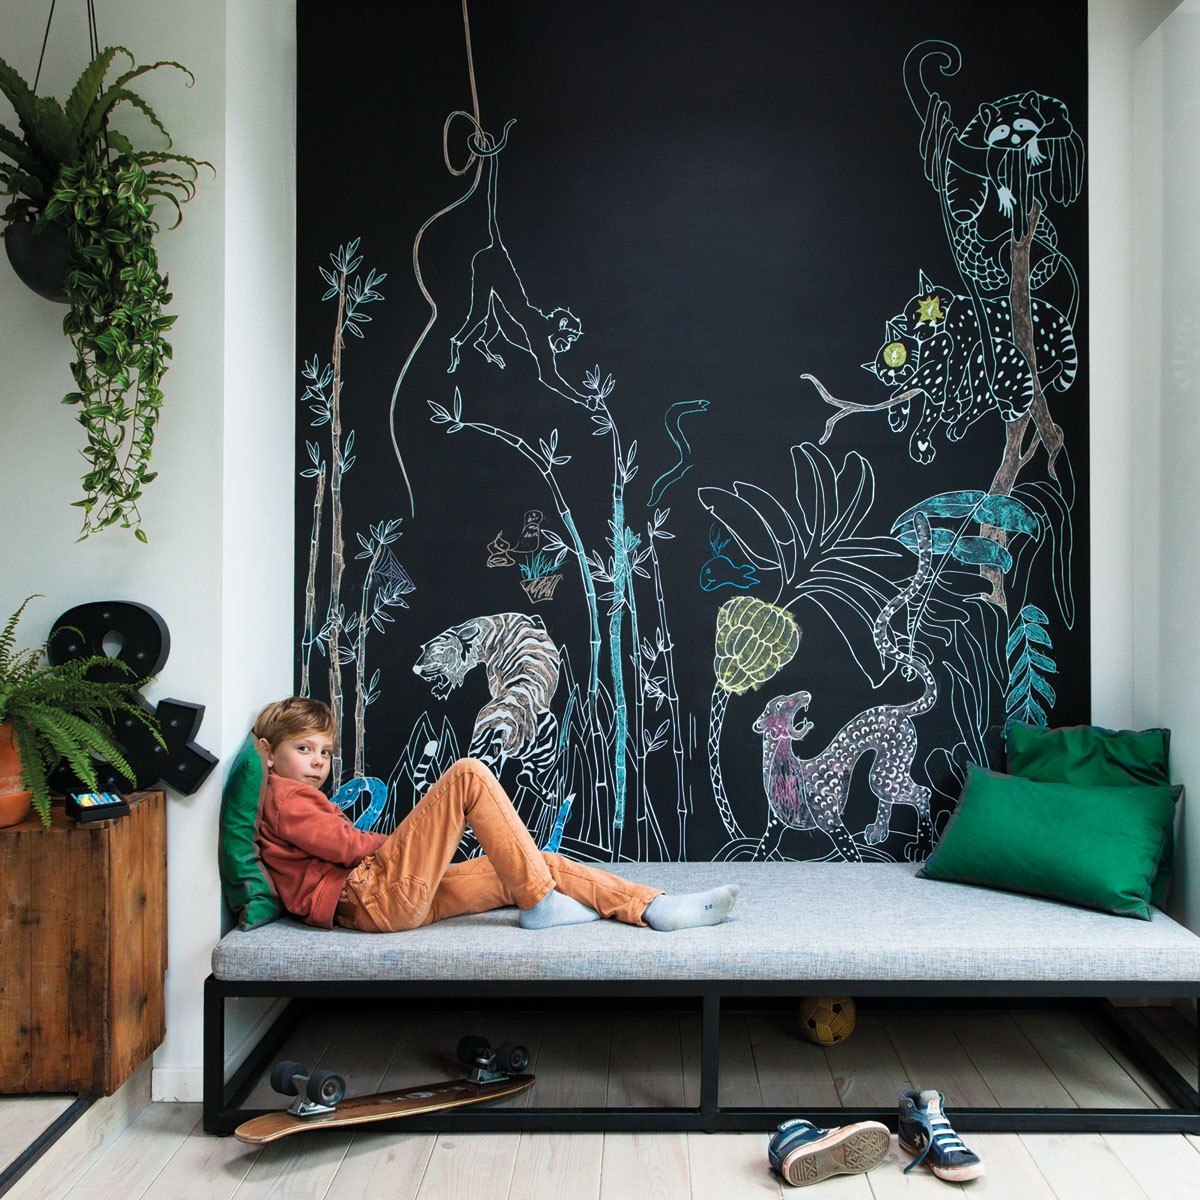 Krijtbord magneetbehang Jungle print | Groovy Magnets